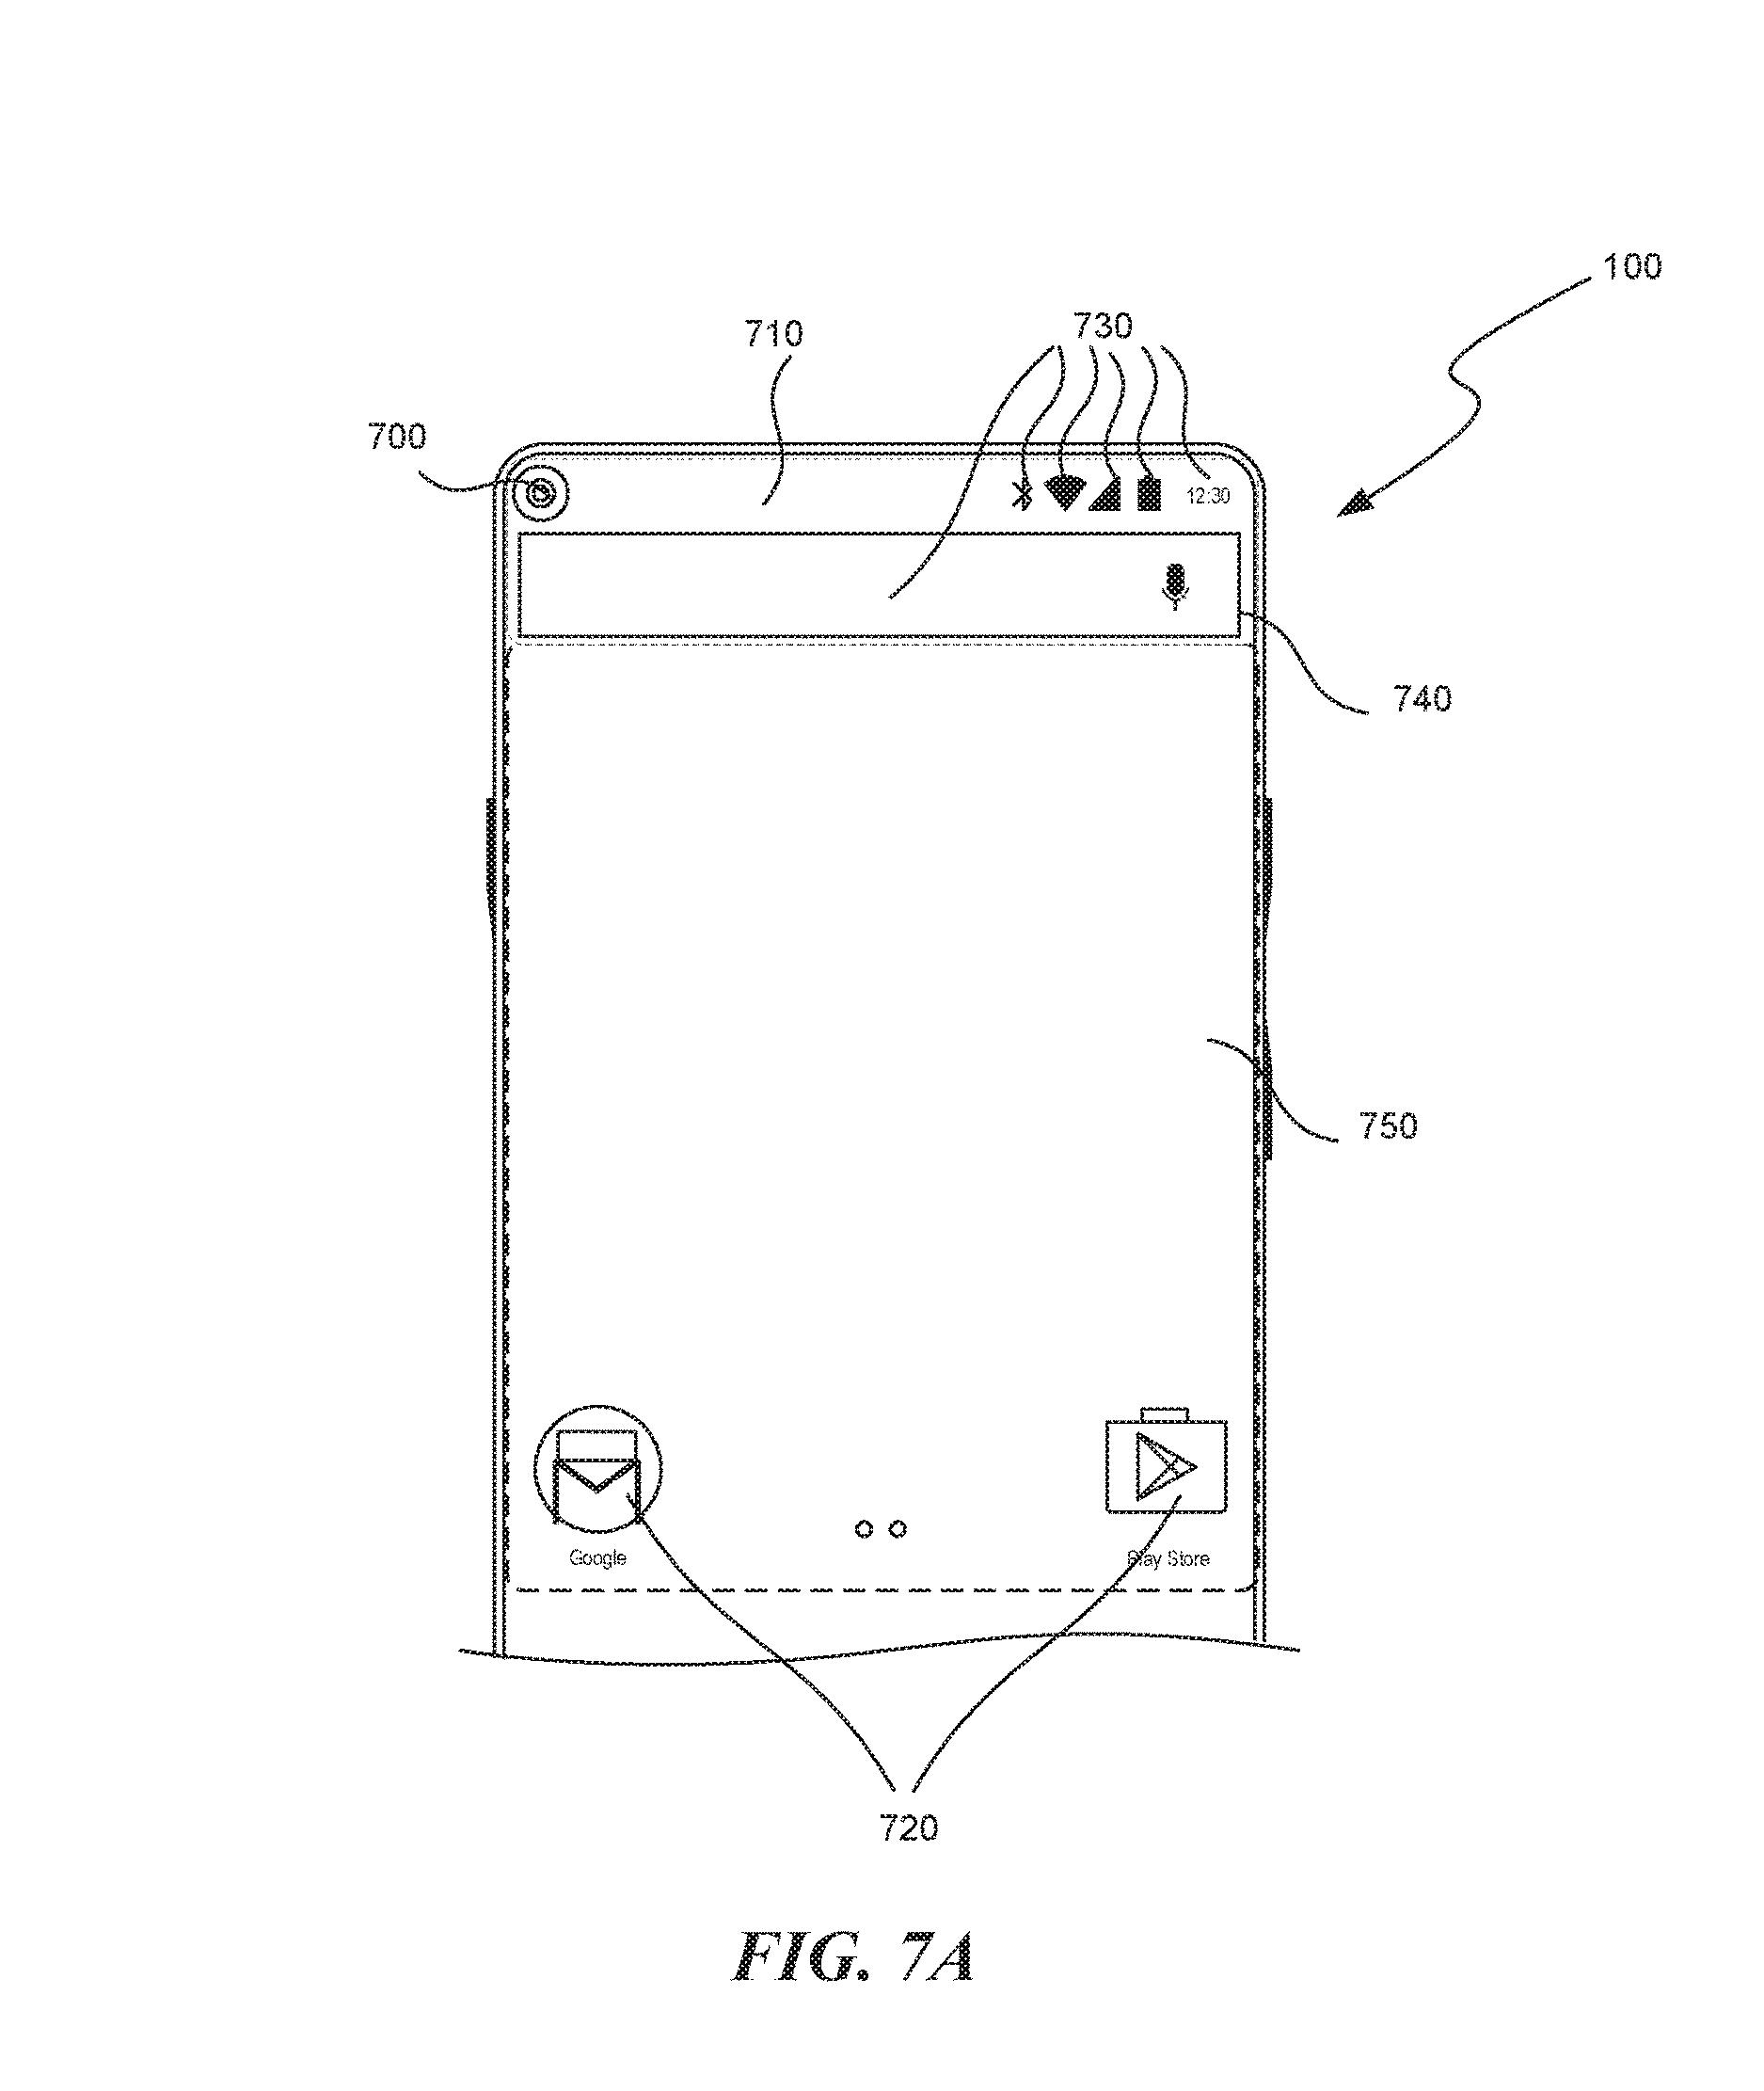 Essential Pop up Camera Patent 19